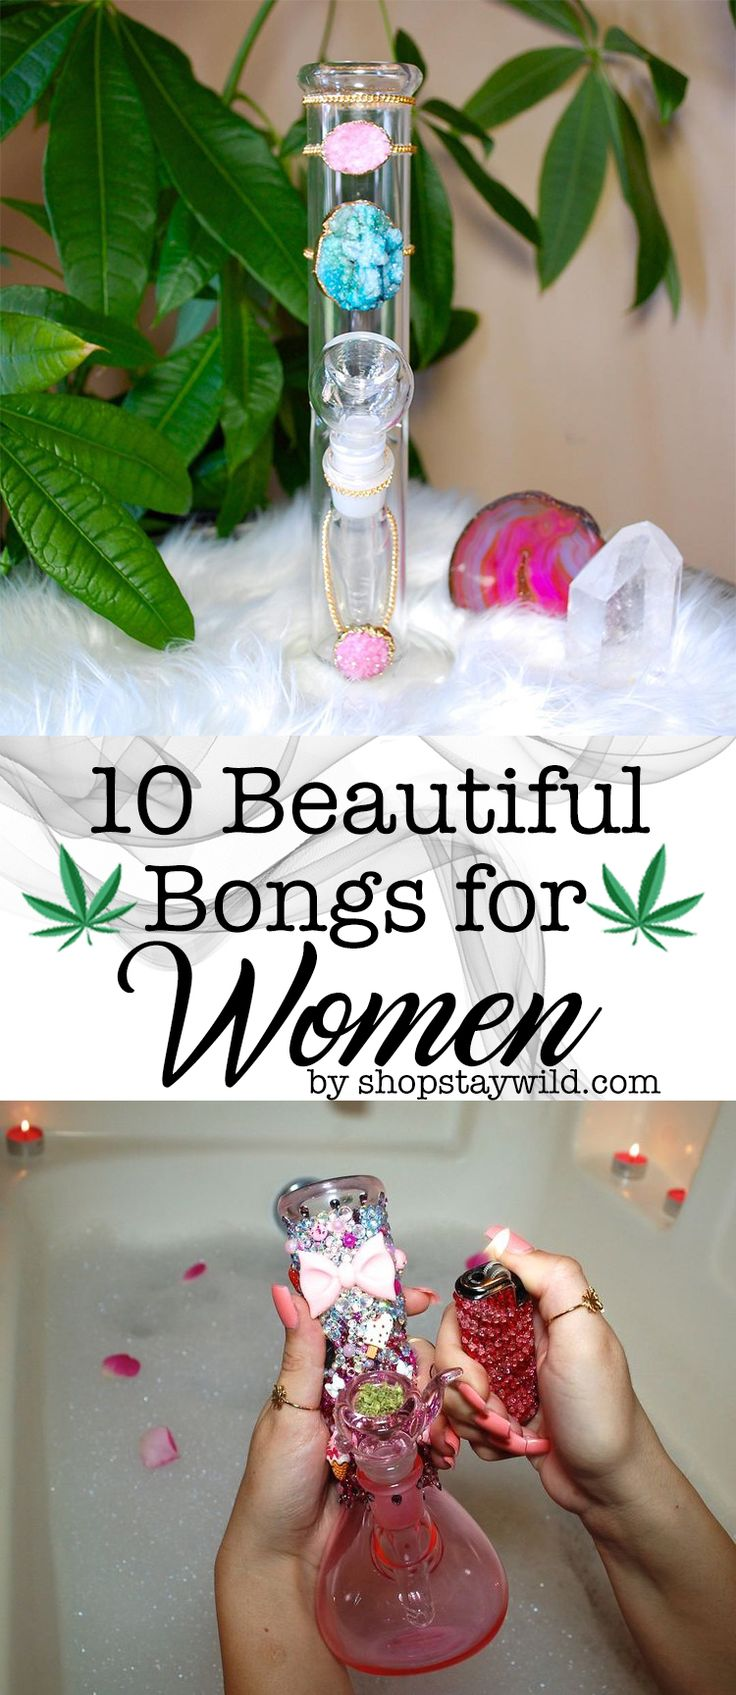 10 Beautiful Bongs for Women! #cannabis #weed #marijuana #stoner #pot #kush #chronic #ganja #420 #710 #bong #pipe #grinder #chillum #weedhumor #stoned #stoner #get high #smoke weed #women of weed #pot princess #baked barbie #dabs #papers #joints #blunts